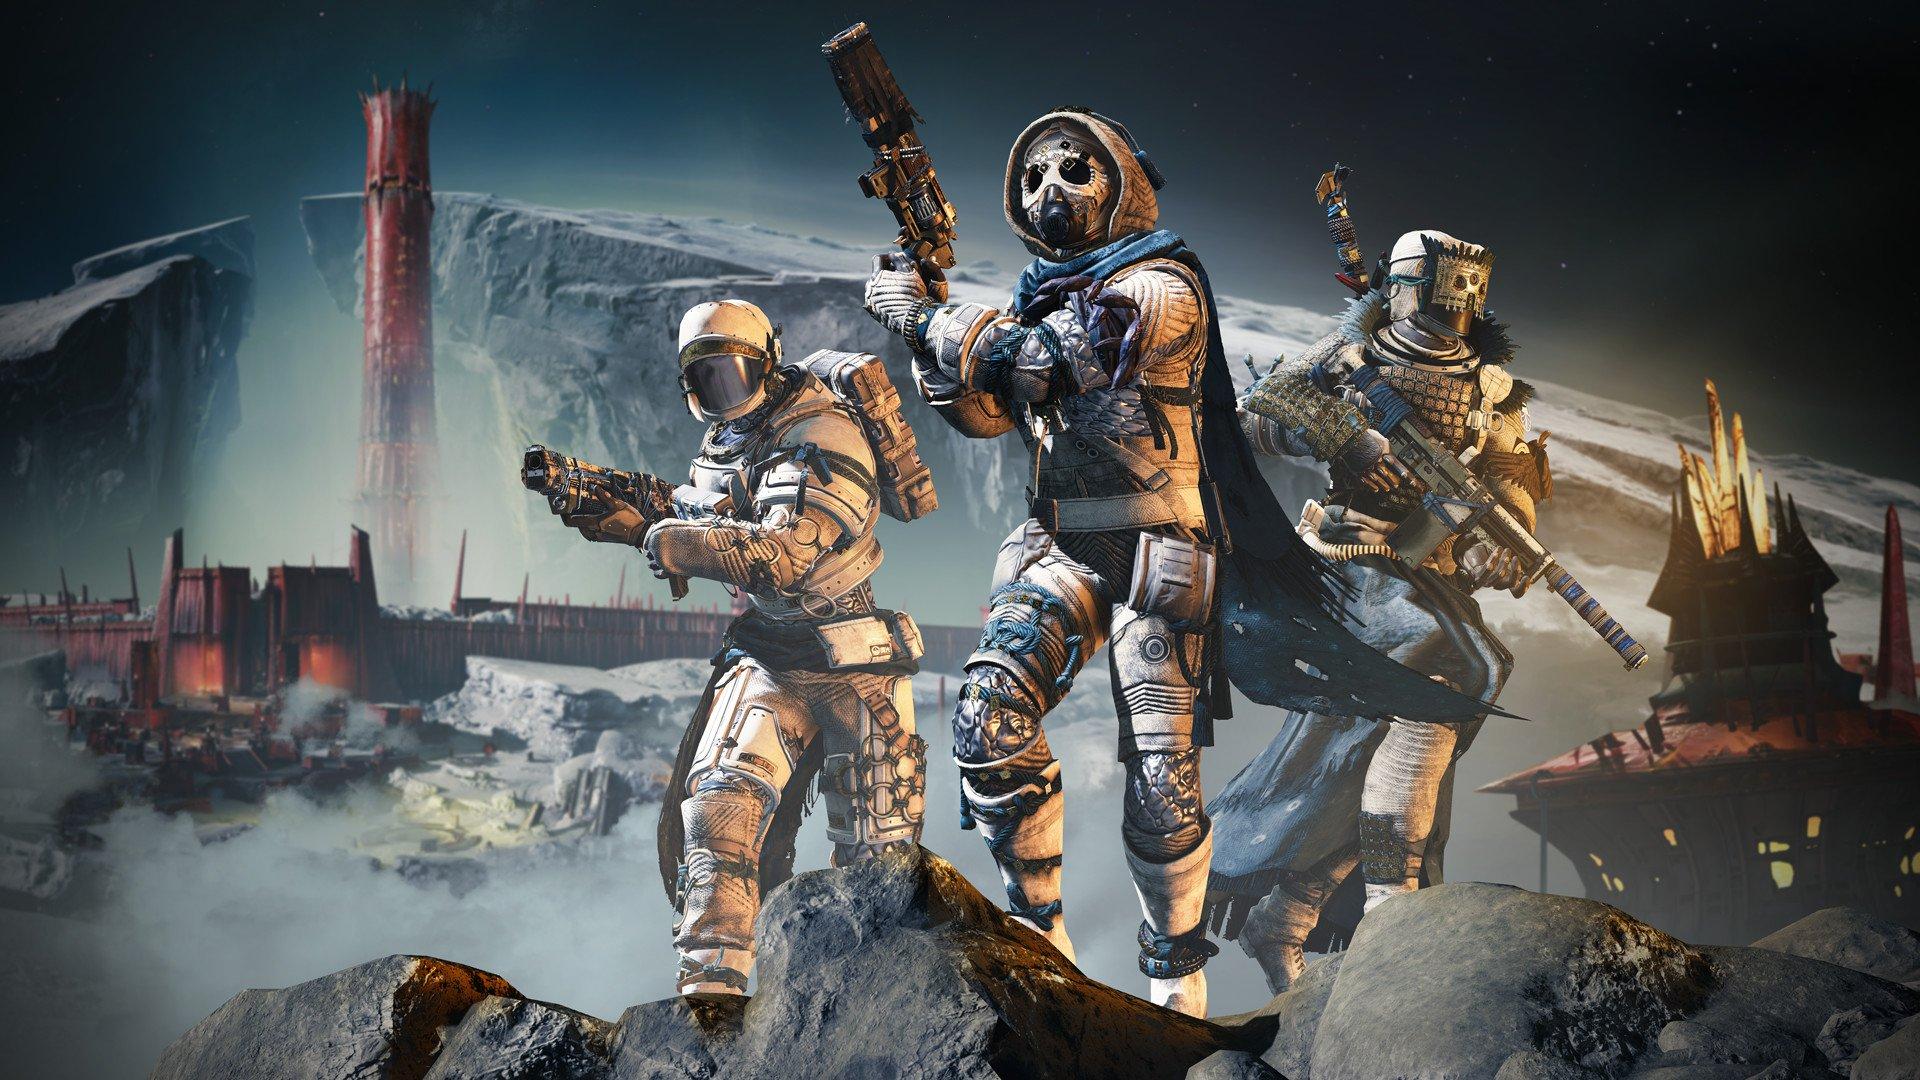 Destiny 2: Shadowkeep review in progress